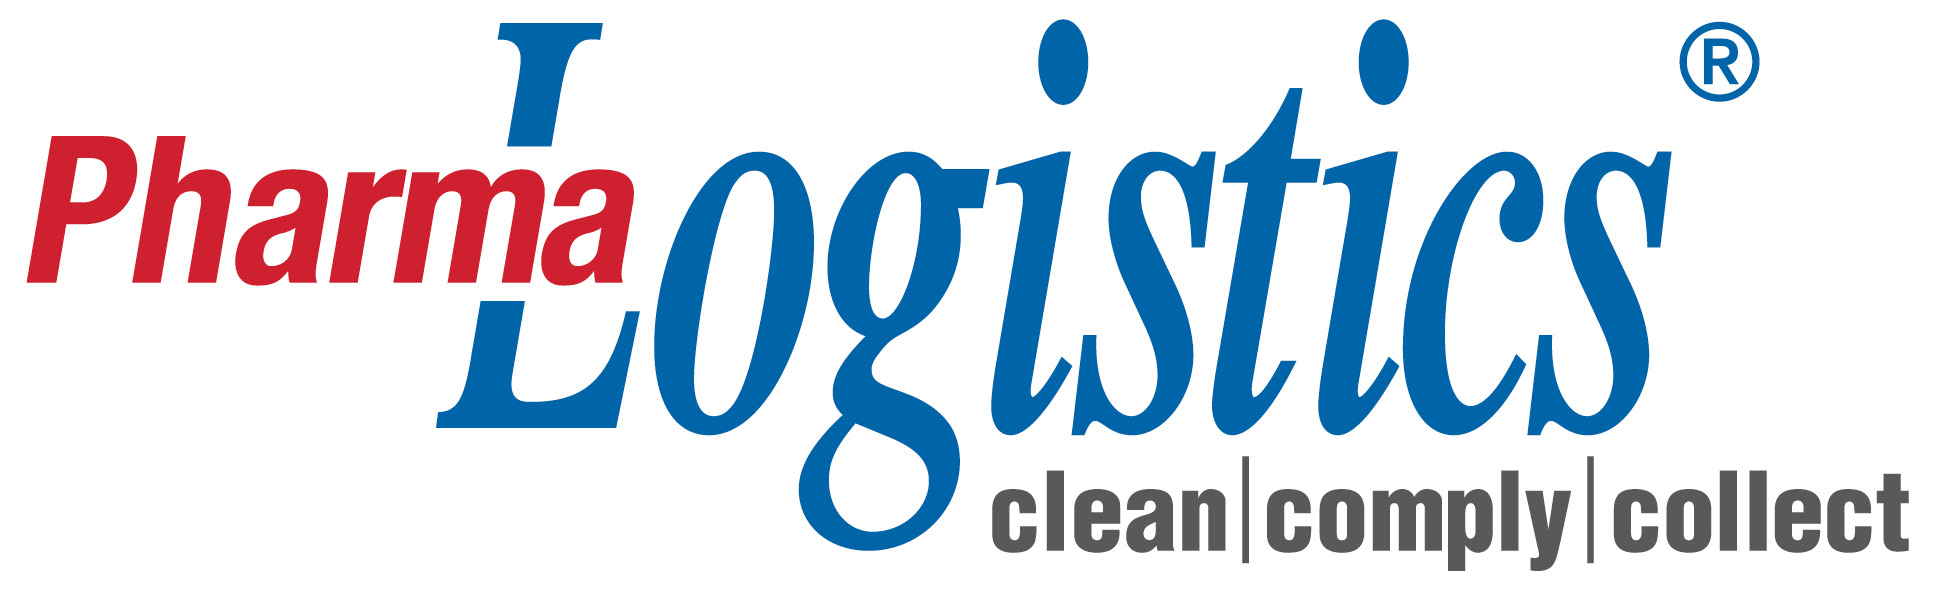 pharma logistics logo